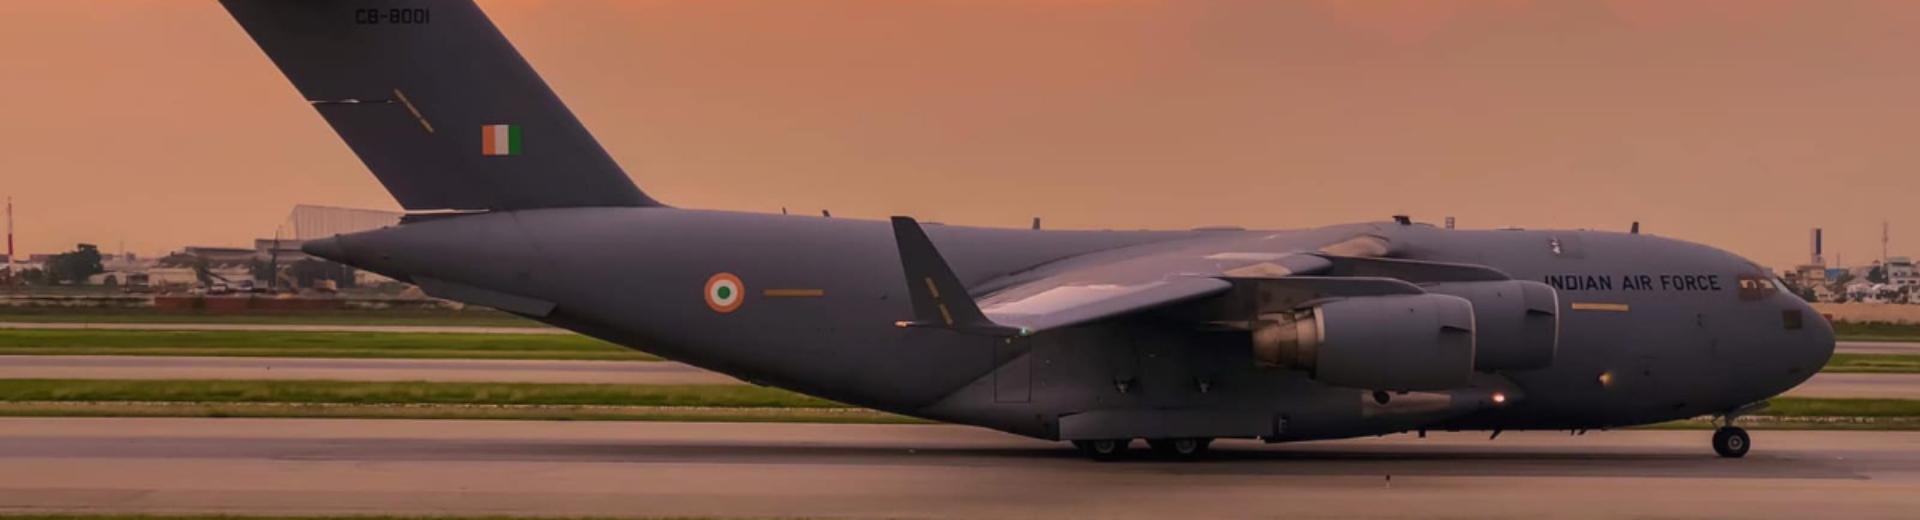 Inian Air Force C-17 at Suvarnabhumi Airport